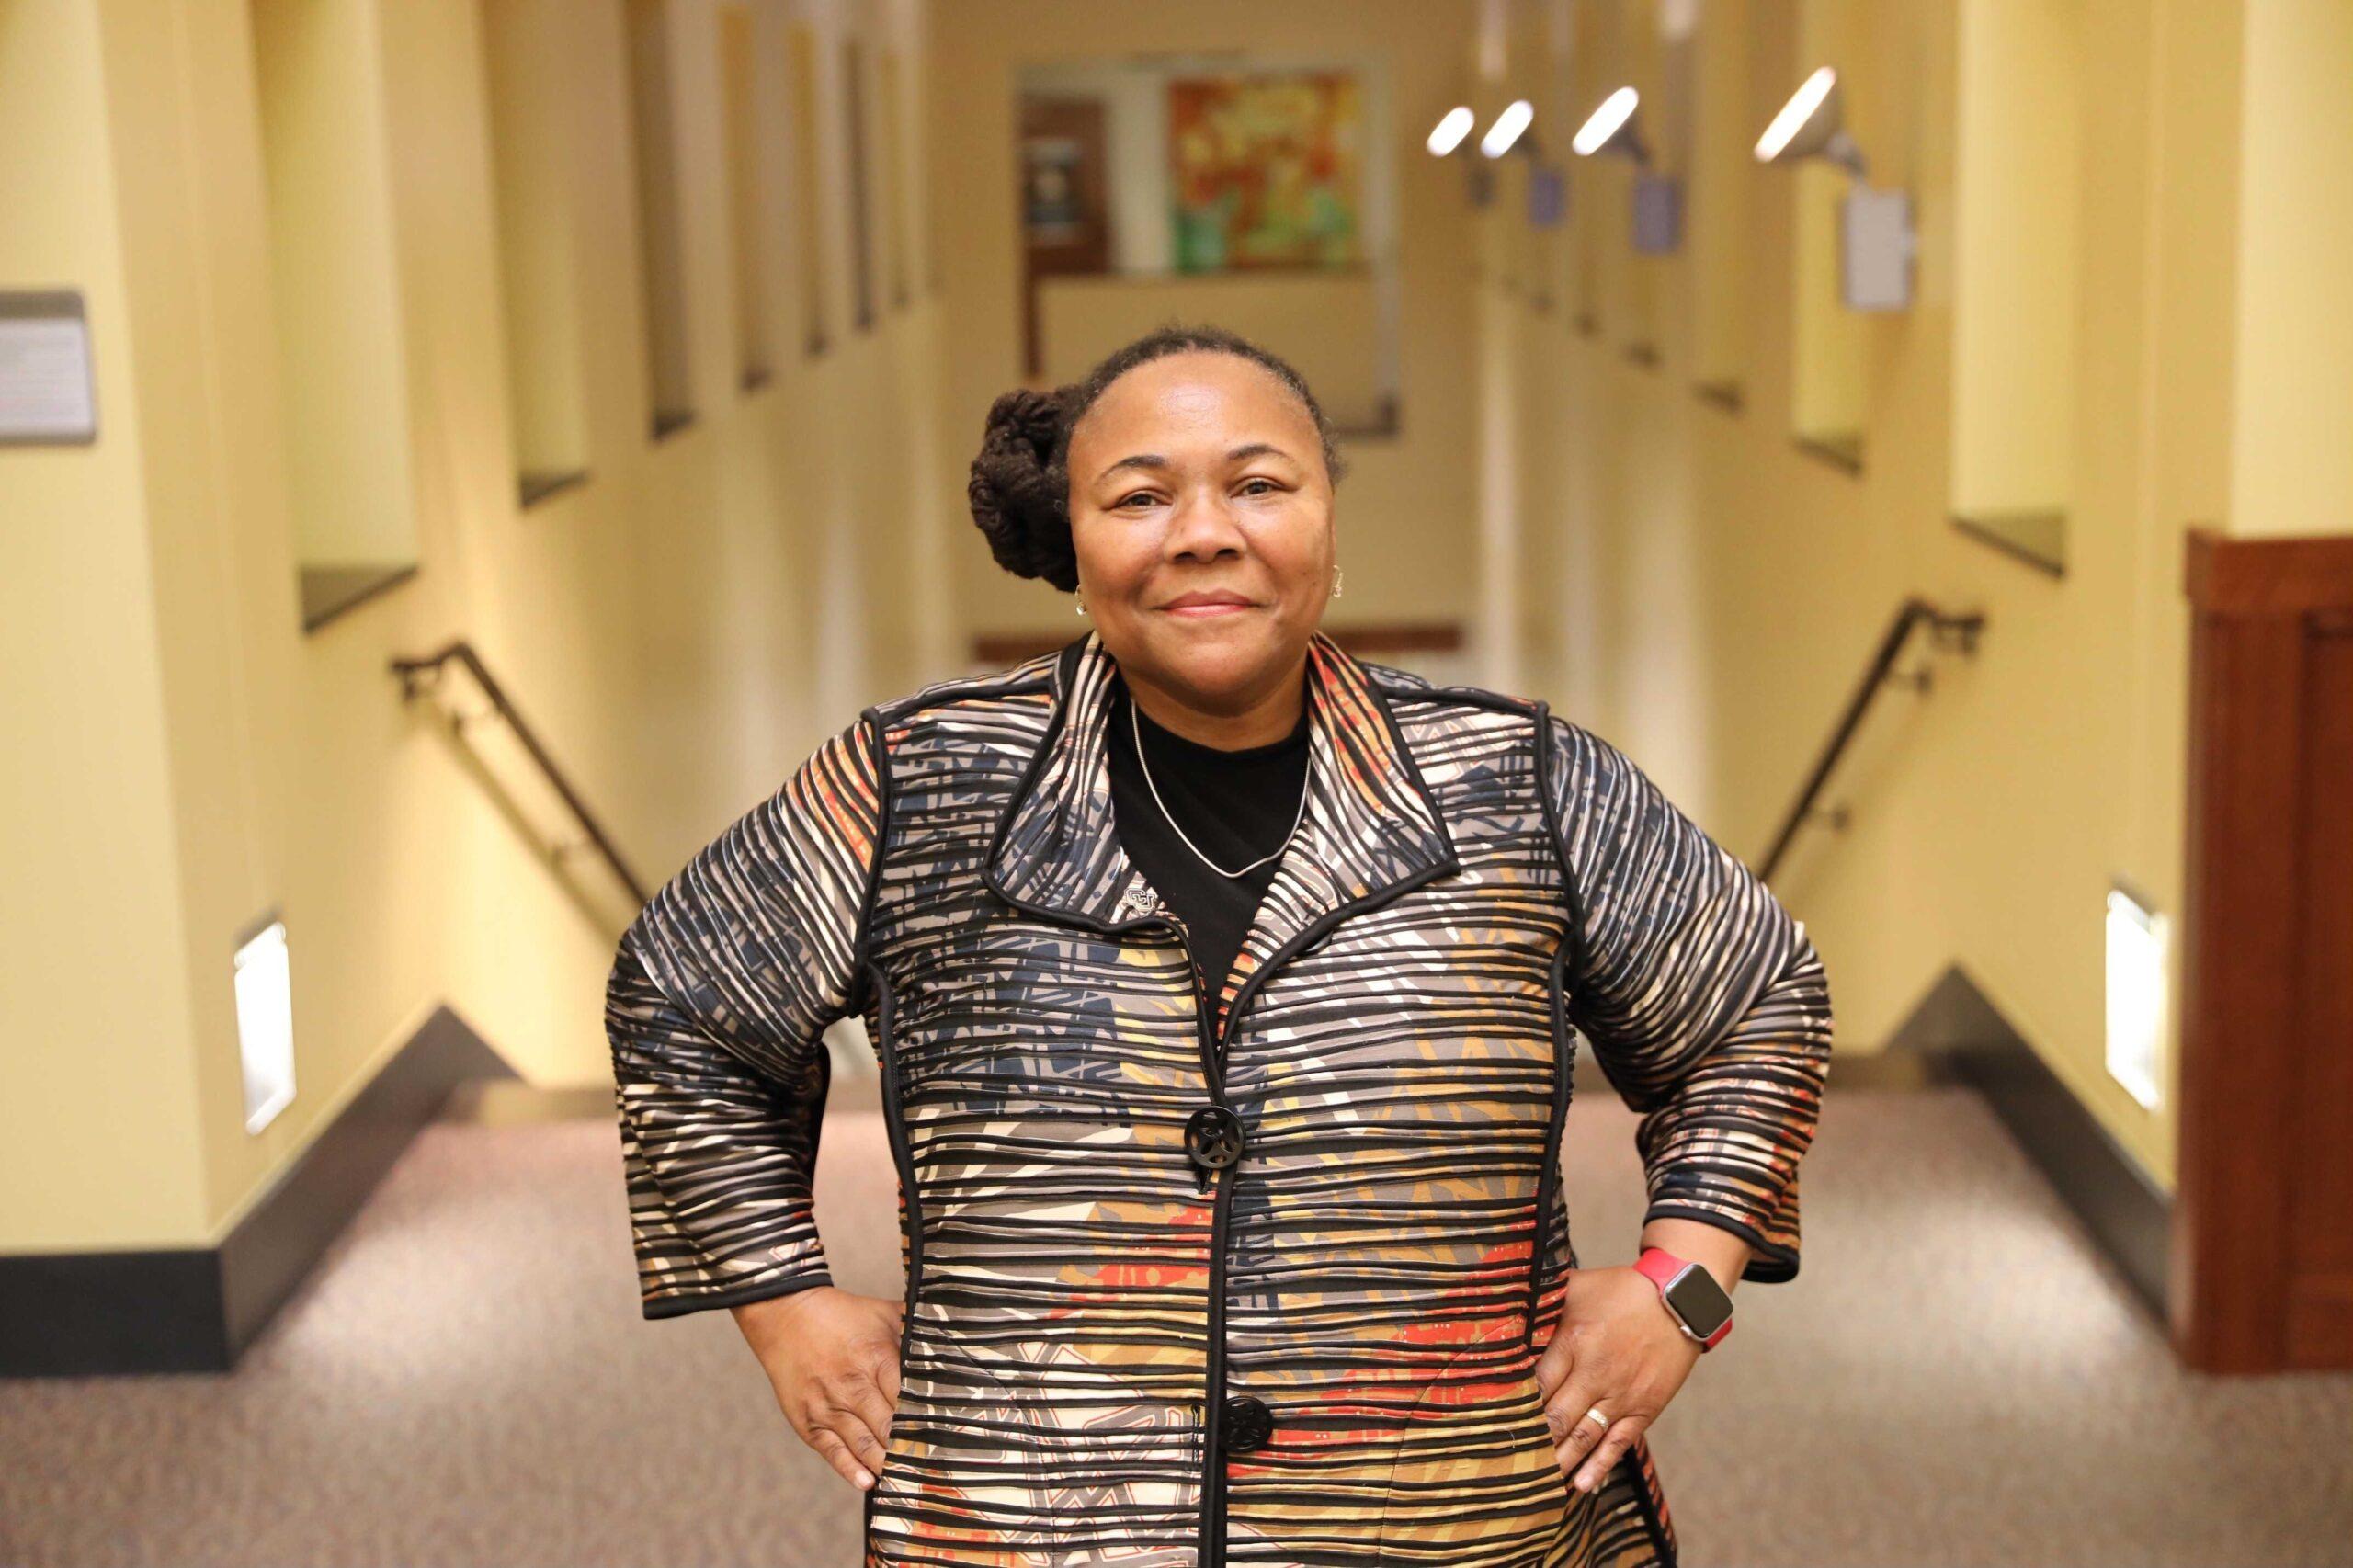 Lolita Buckner Inniss CU University of Colorado law school first Black dean